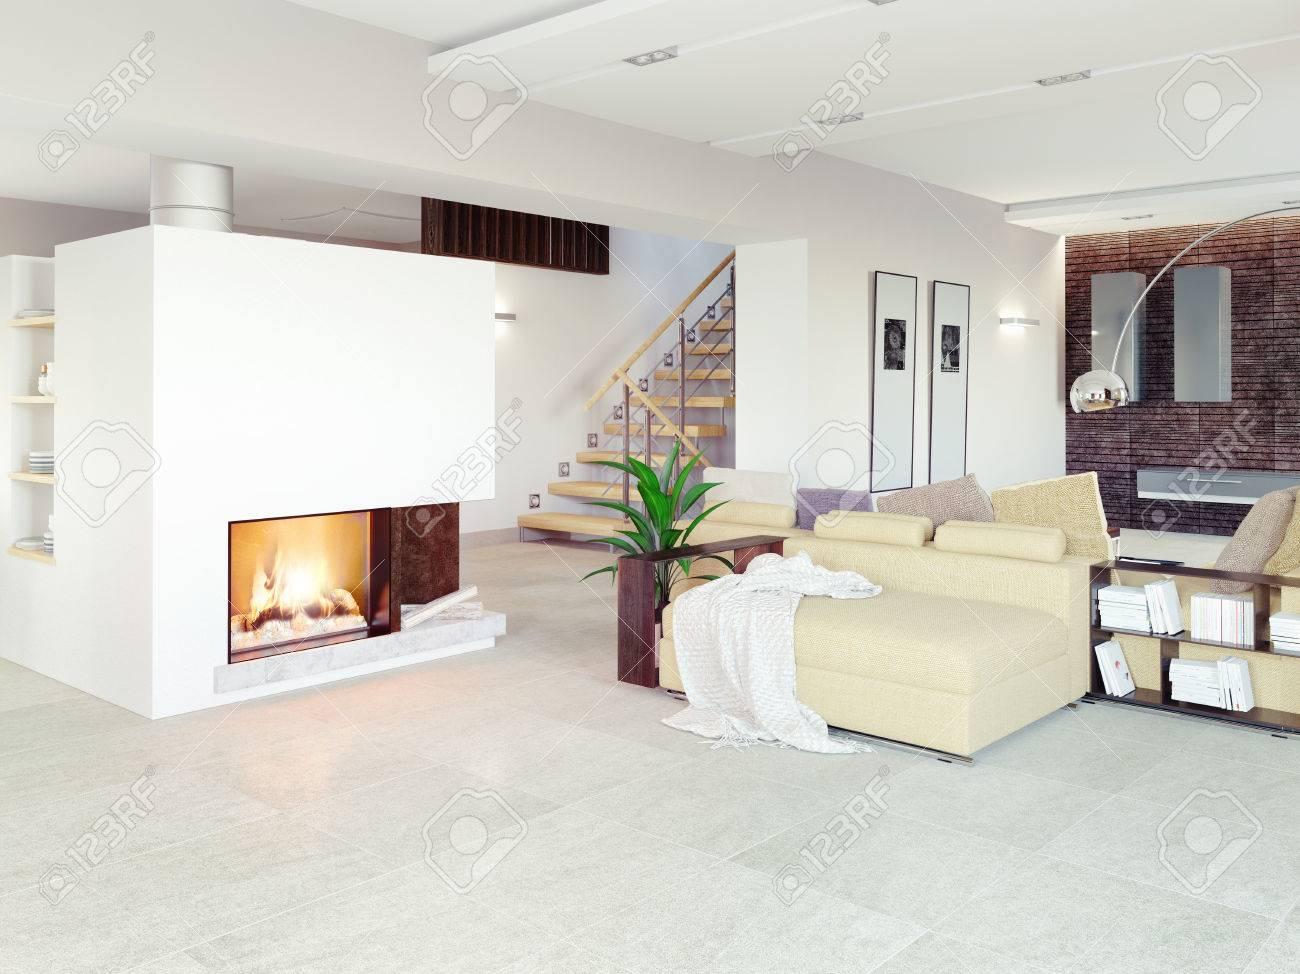 Modern Living Room Interior CG Concept Stock Photo